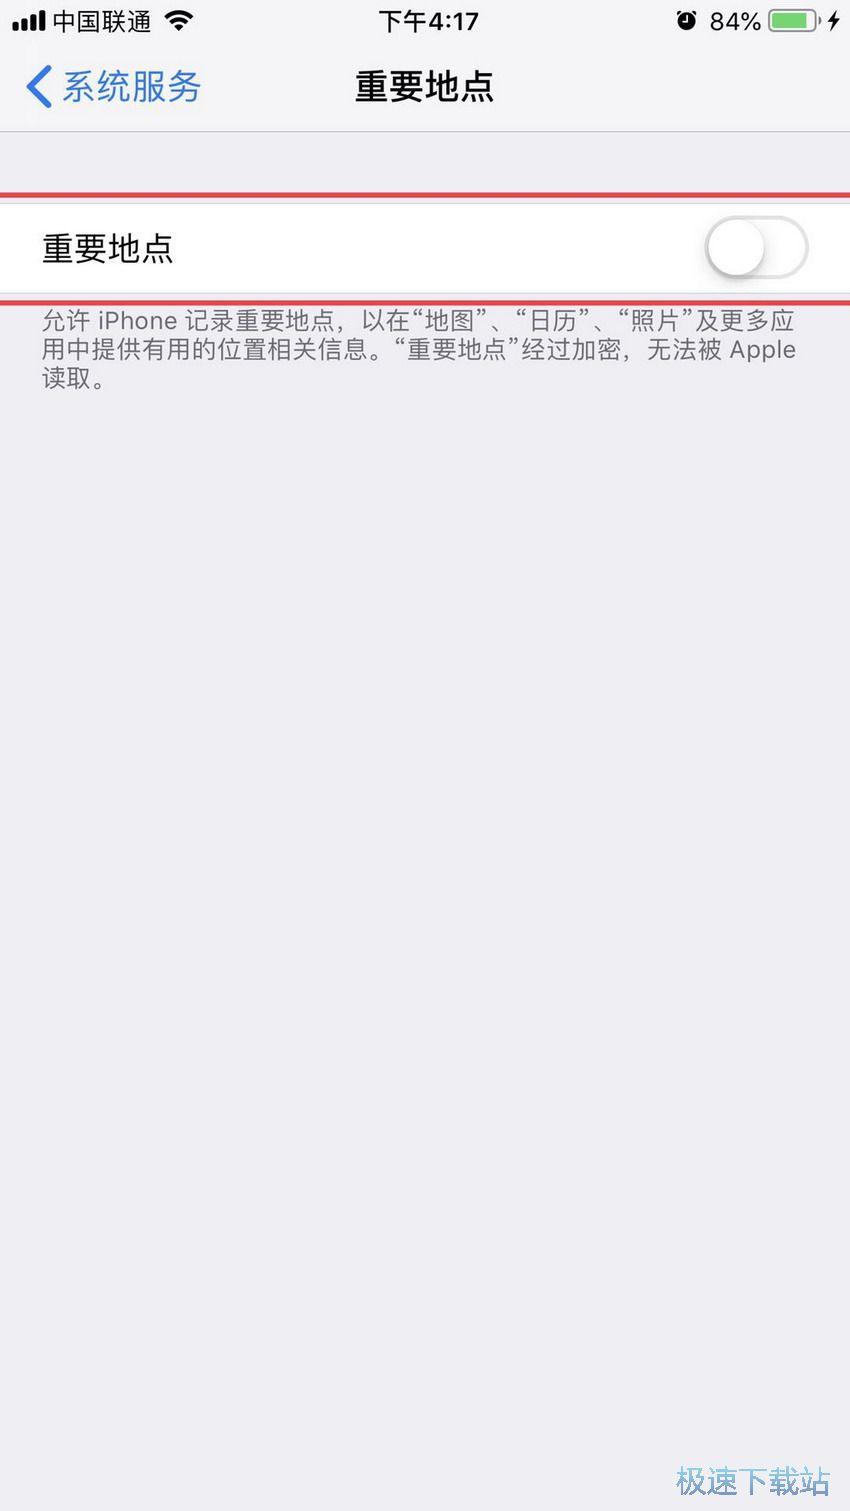 iPhone手�C怎么�O置才安全?保�o�[私四大步�E �s略�D